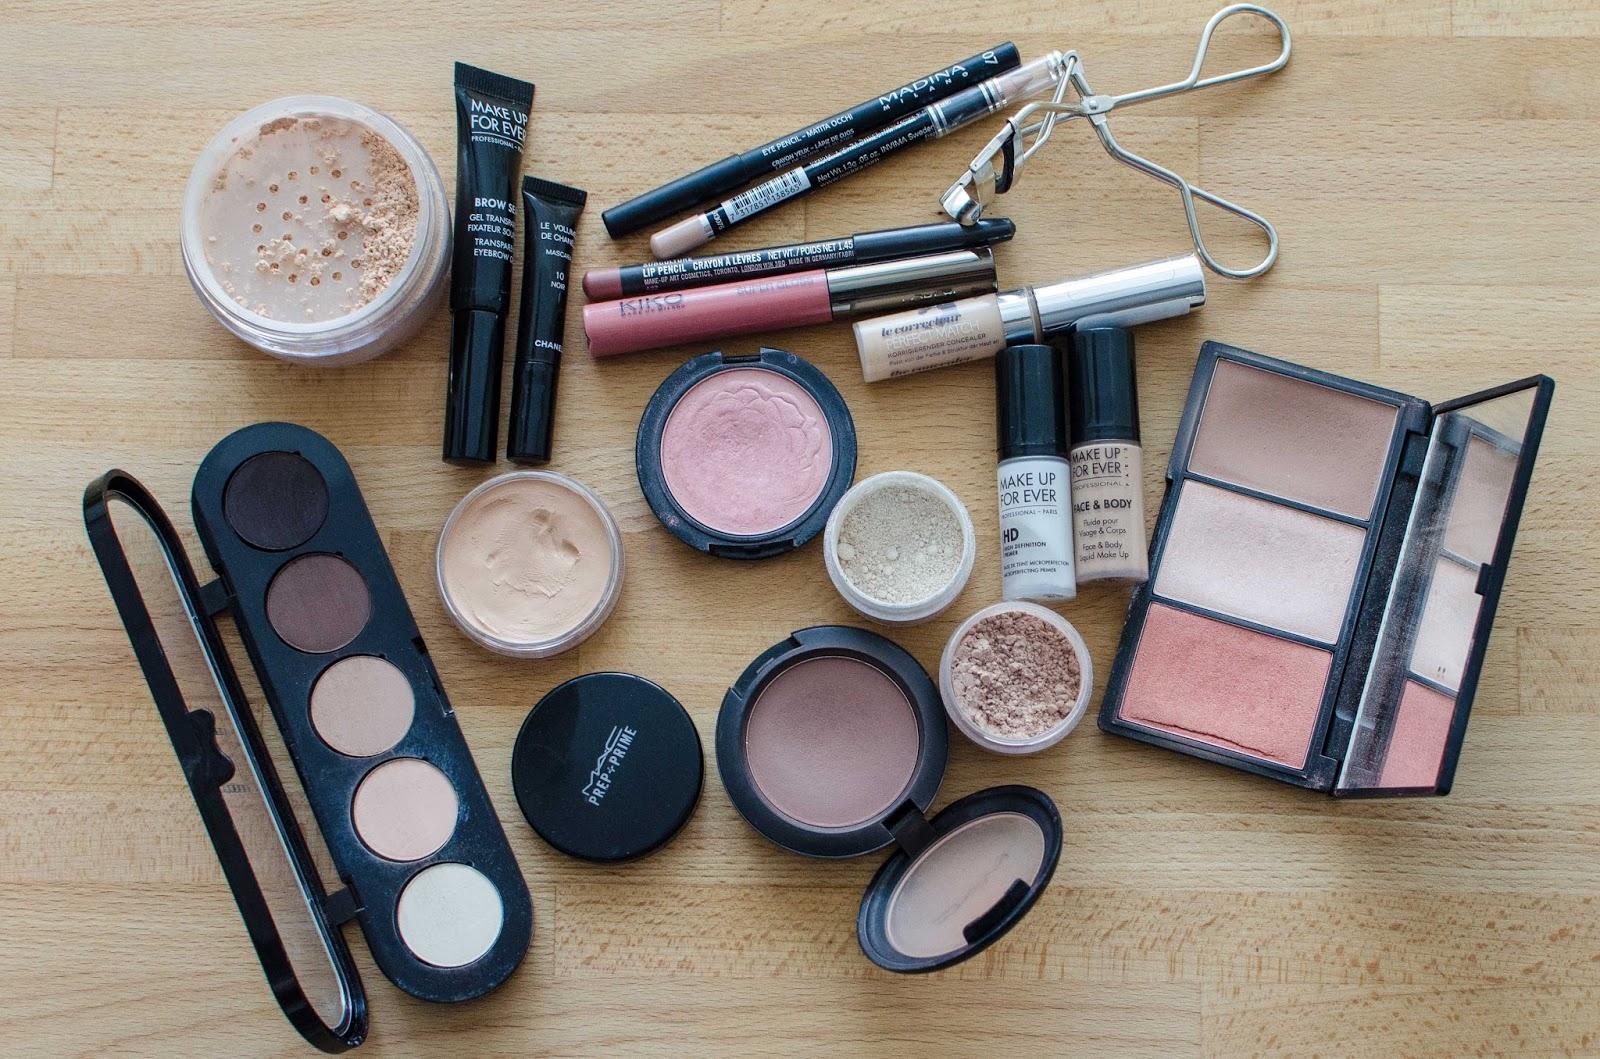 Средства для макияжа в домашних условиях 951